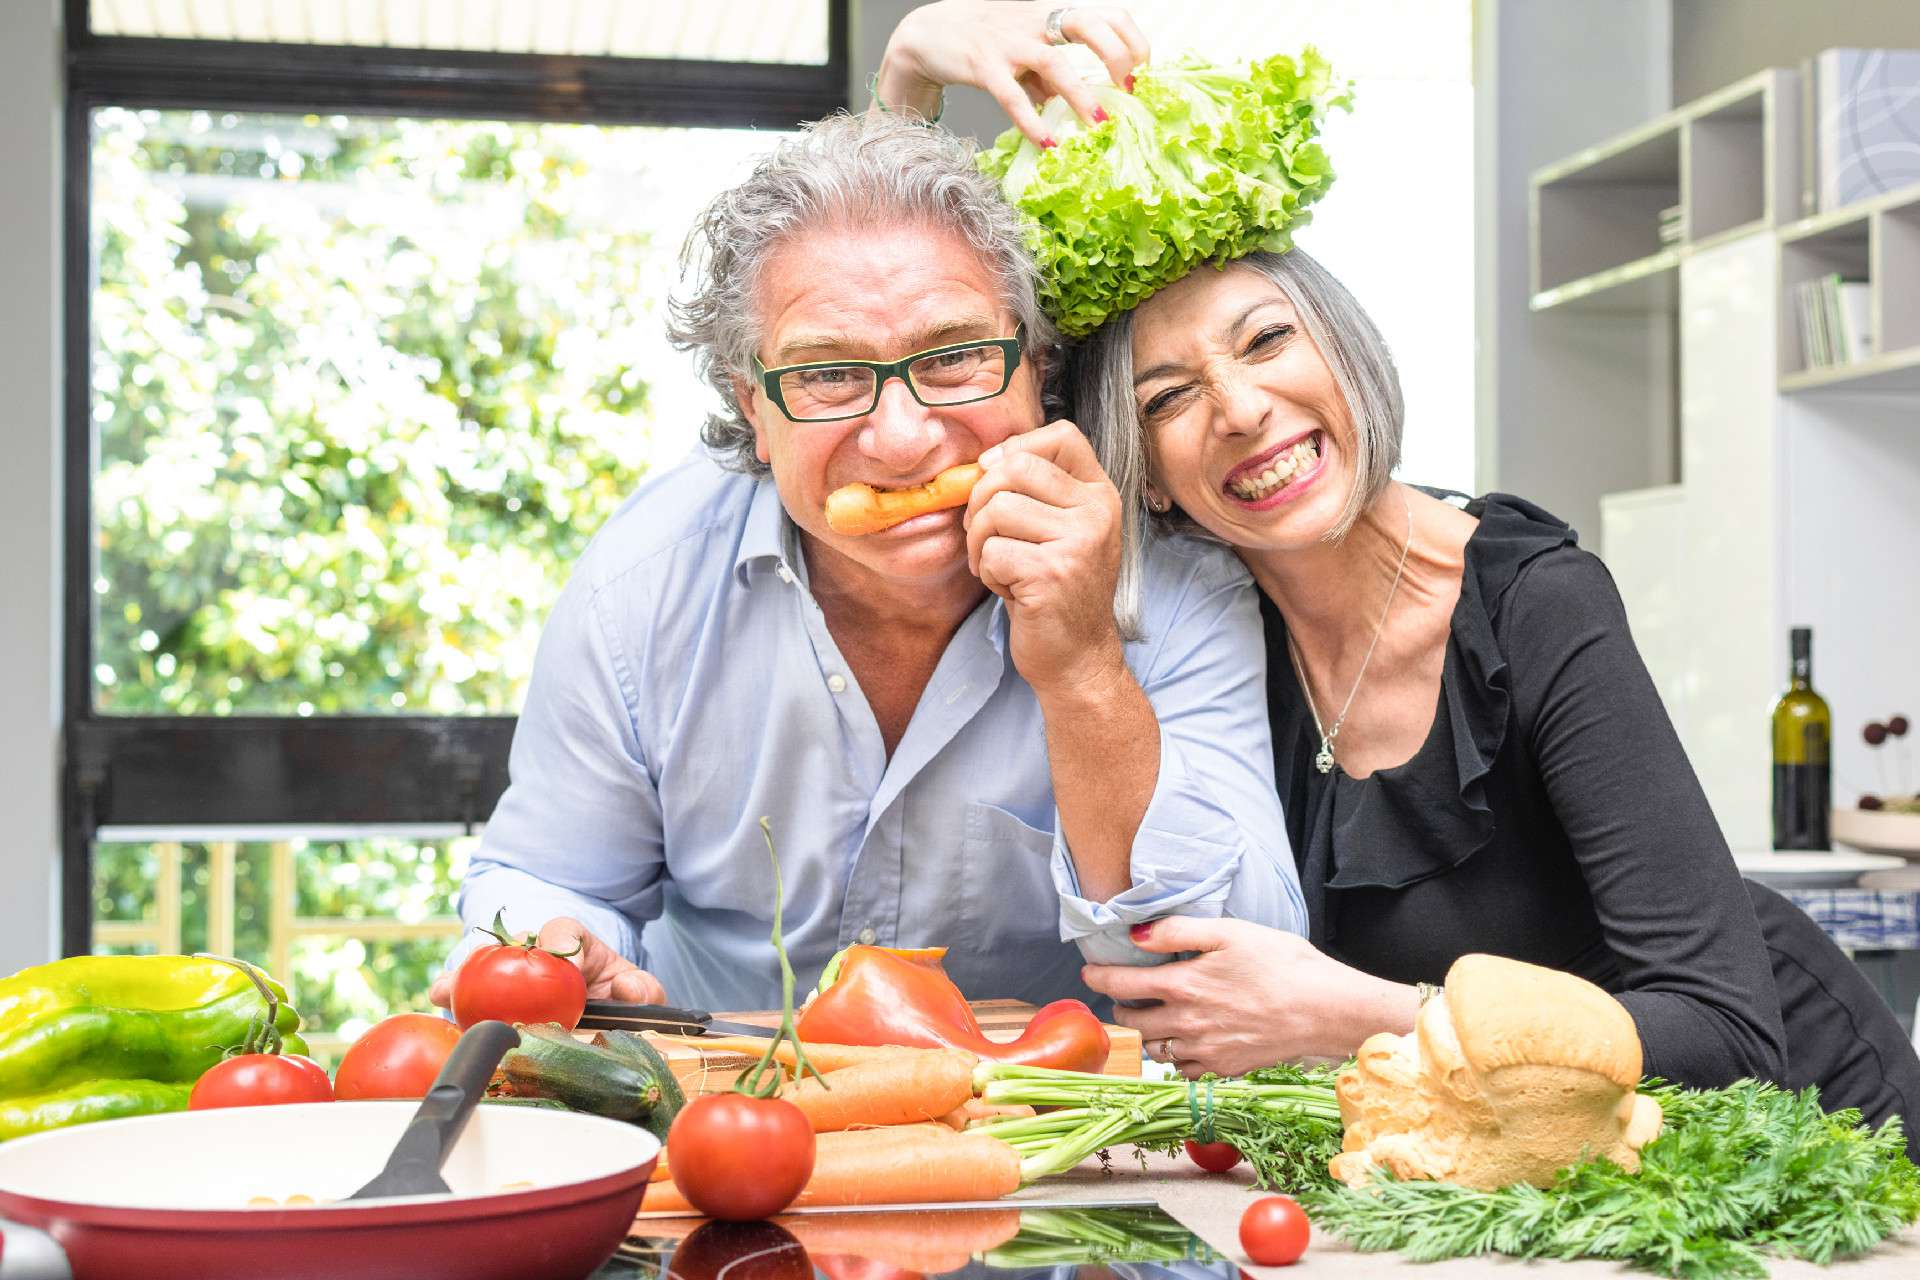 4 Pillars Functional Medicine – Couple Preparing Food